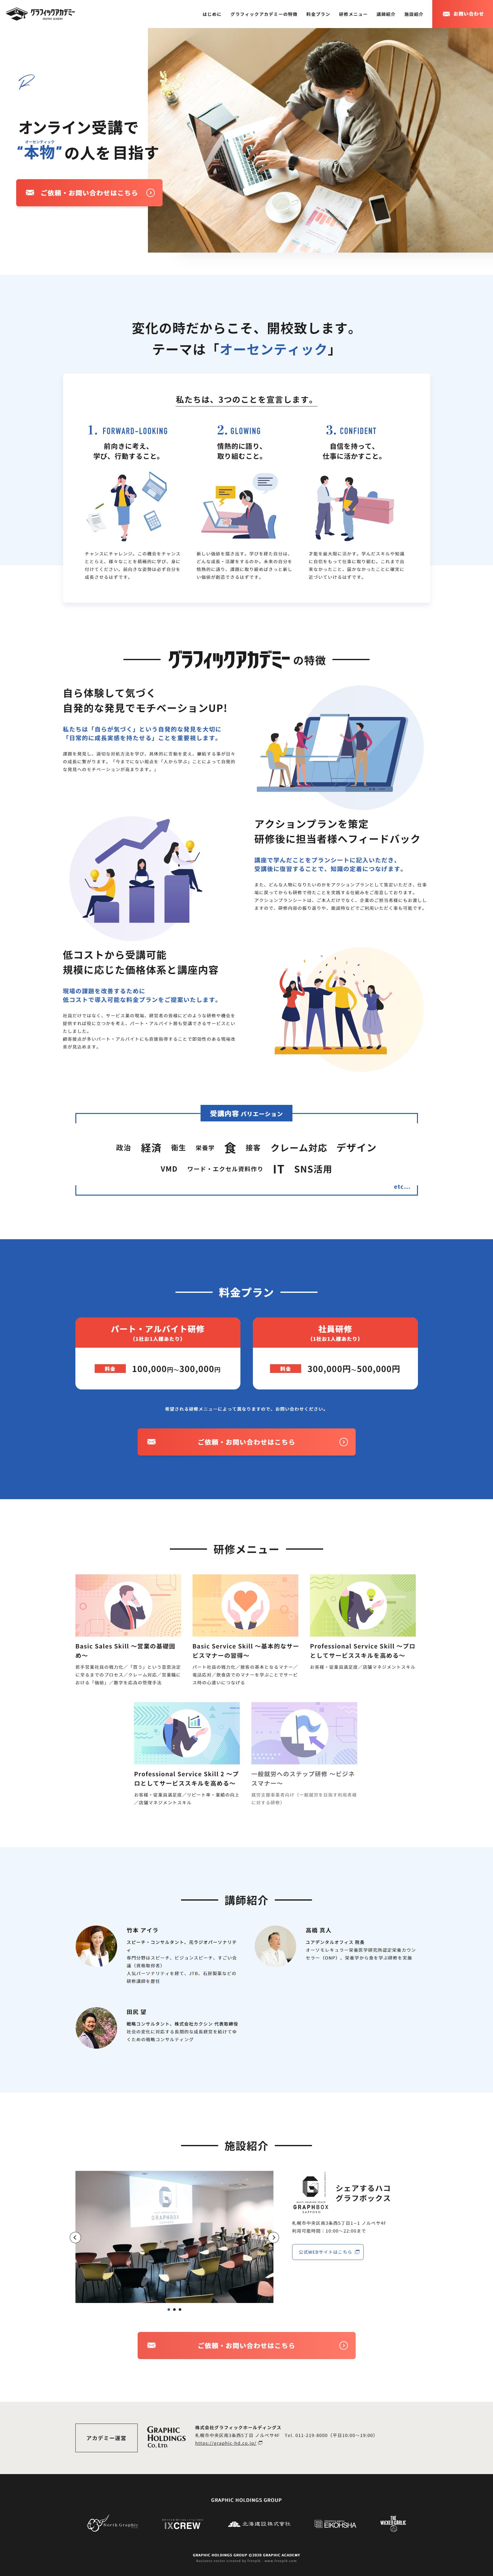 Web Design おしゃれまとめの人気アイデア Pinterest Happy Sachi 2020 Lp デザイン 金融 ランディングページ